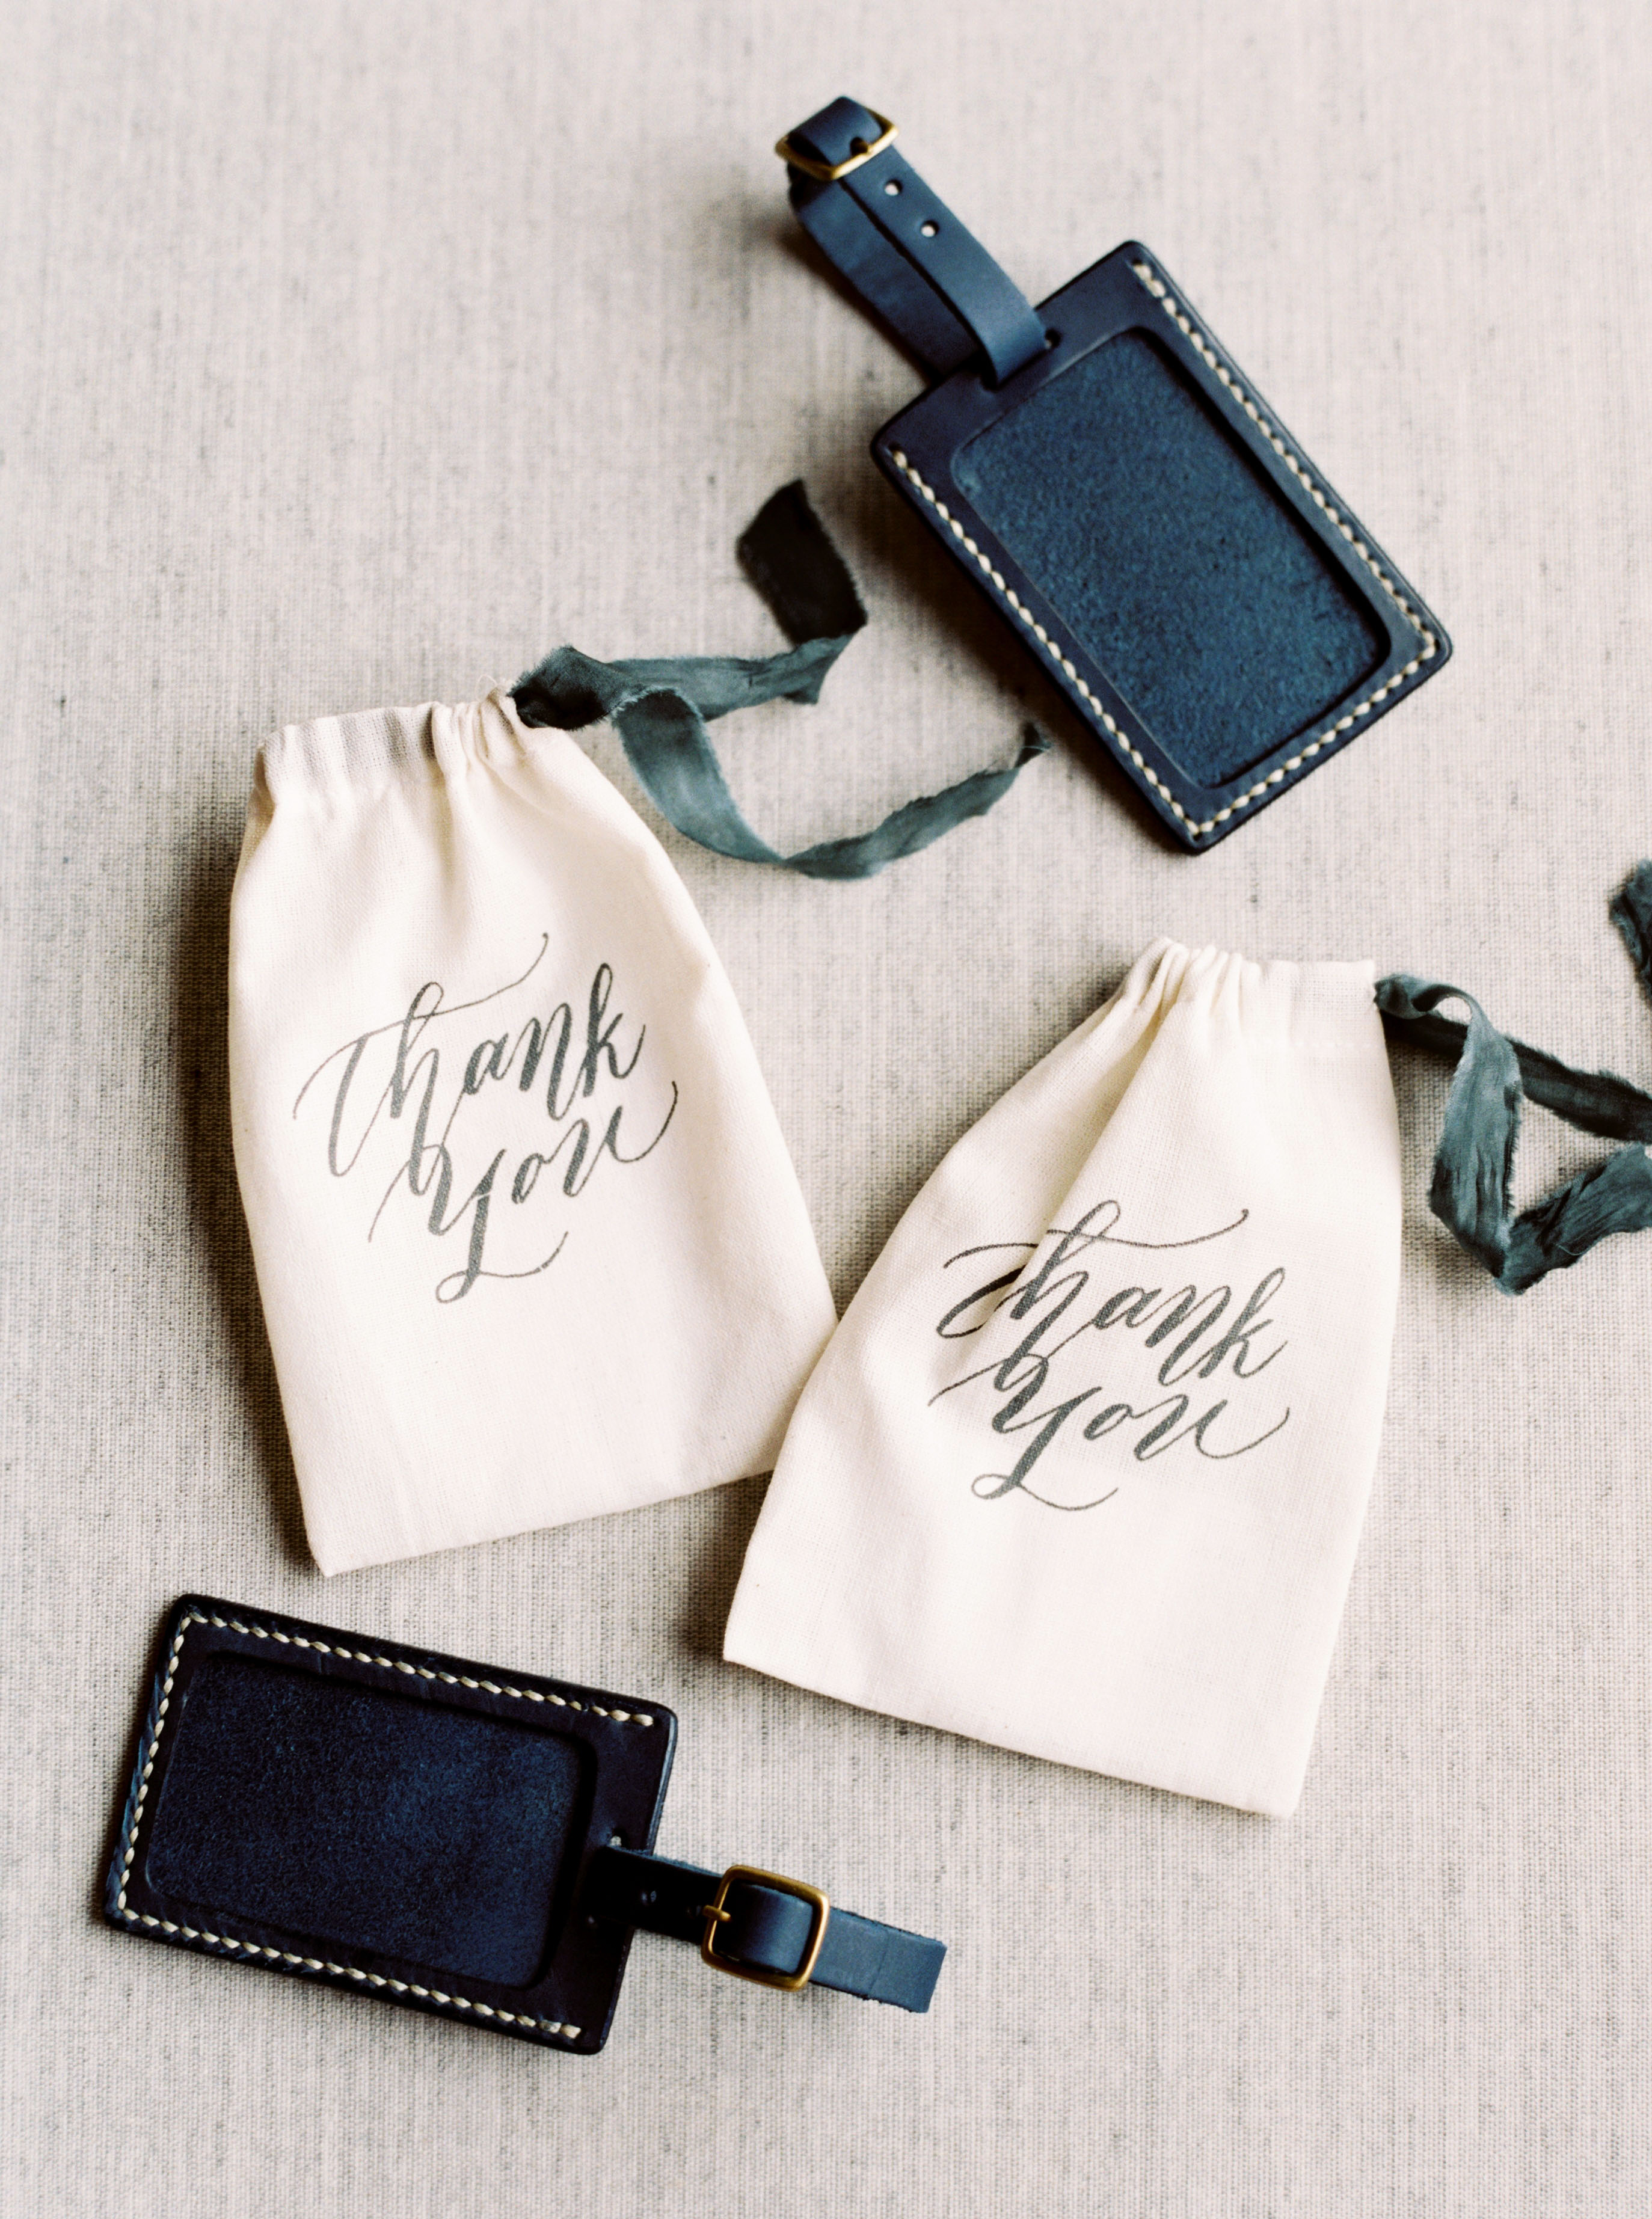 vivi yoga bali wedding ceremony favors luggage tags